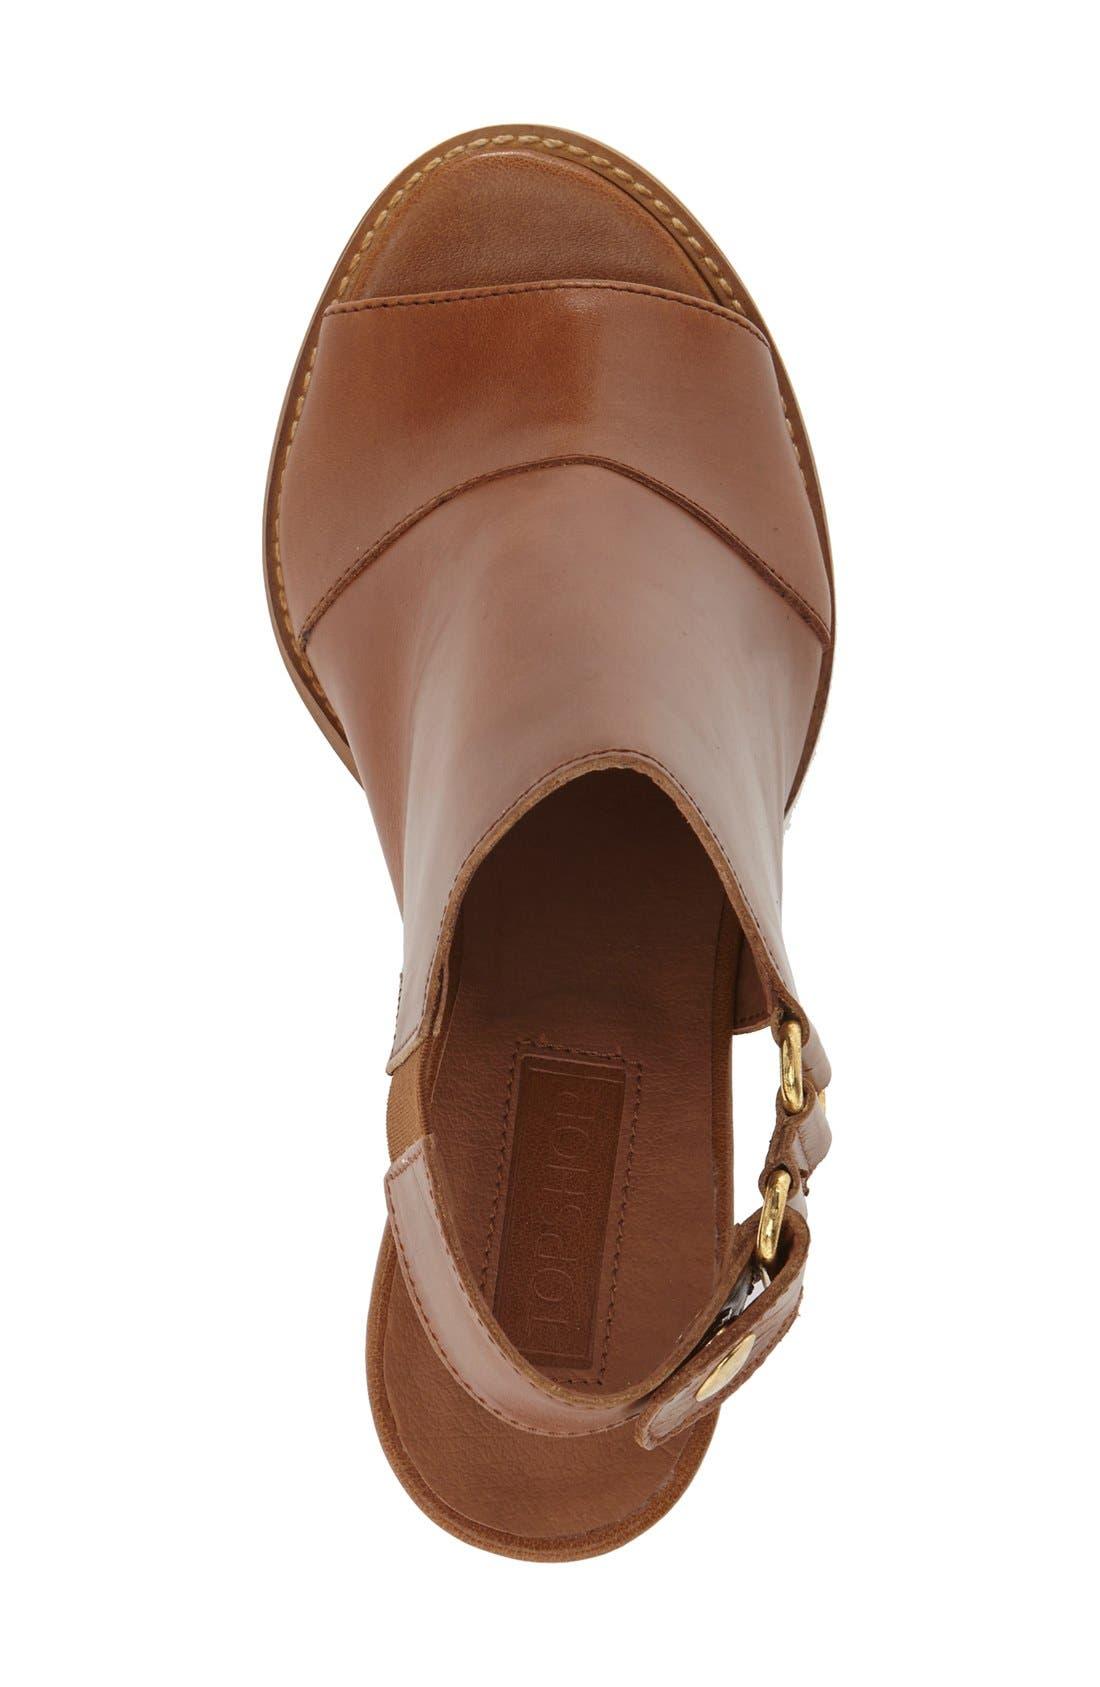 Alternate Image 3  - Topshop 'Nimi' Slingback Round Heel Sandal (Women)